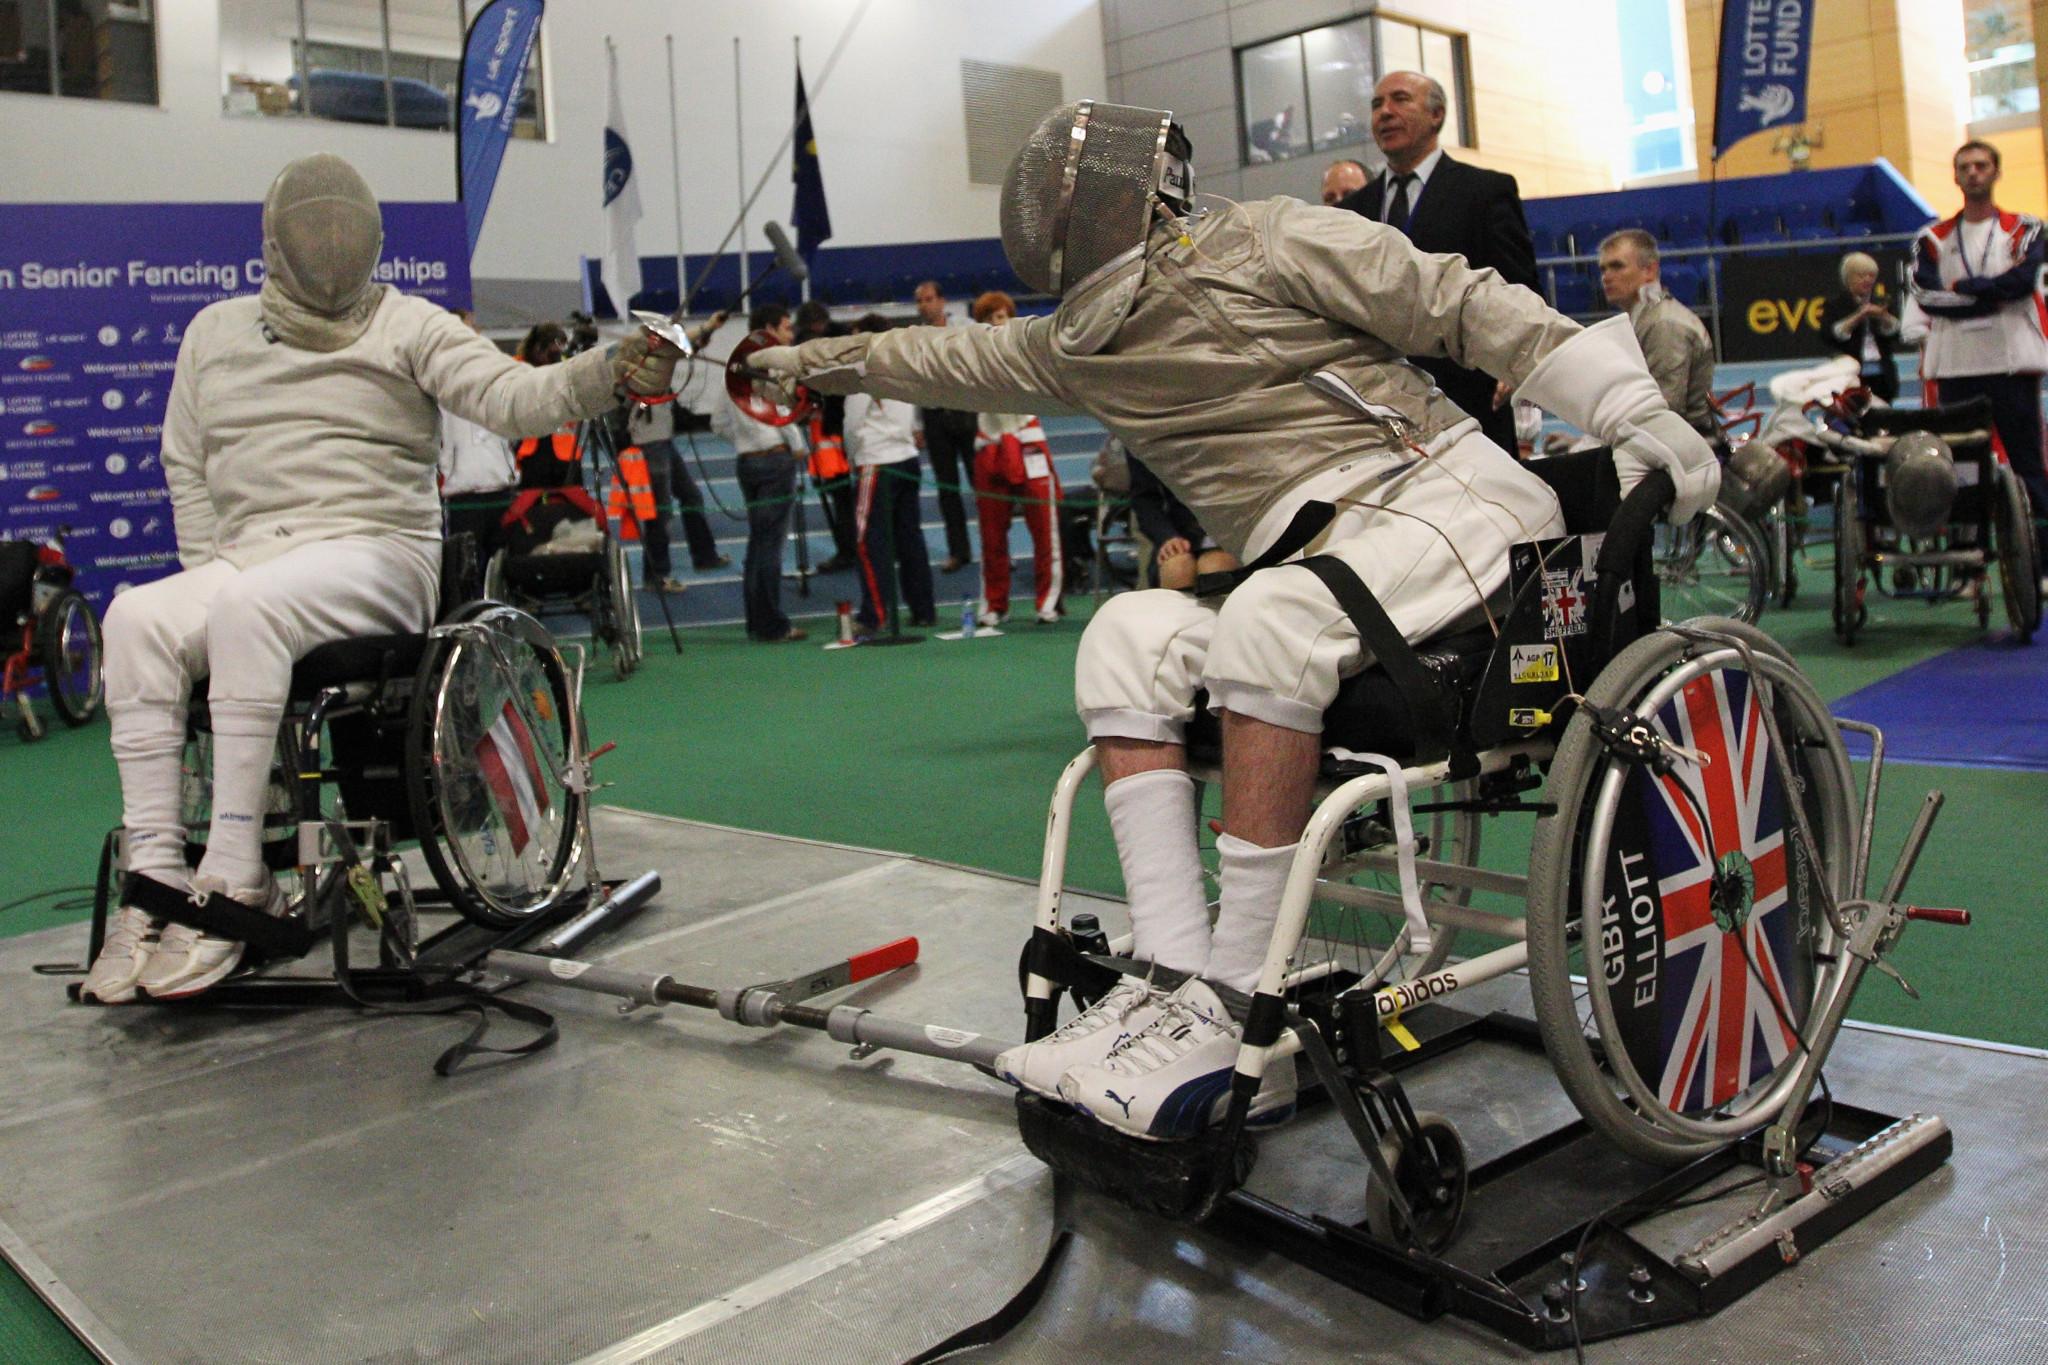 Russia's Kurzin halts Chinese gold run at Wheelchair Fencing World Championships